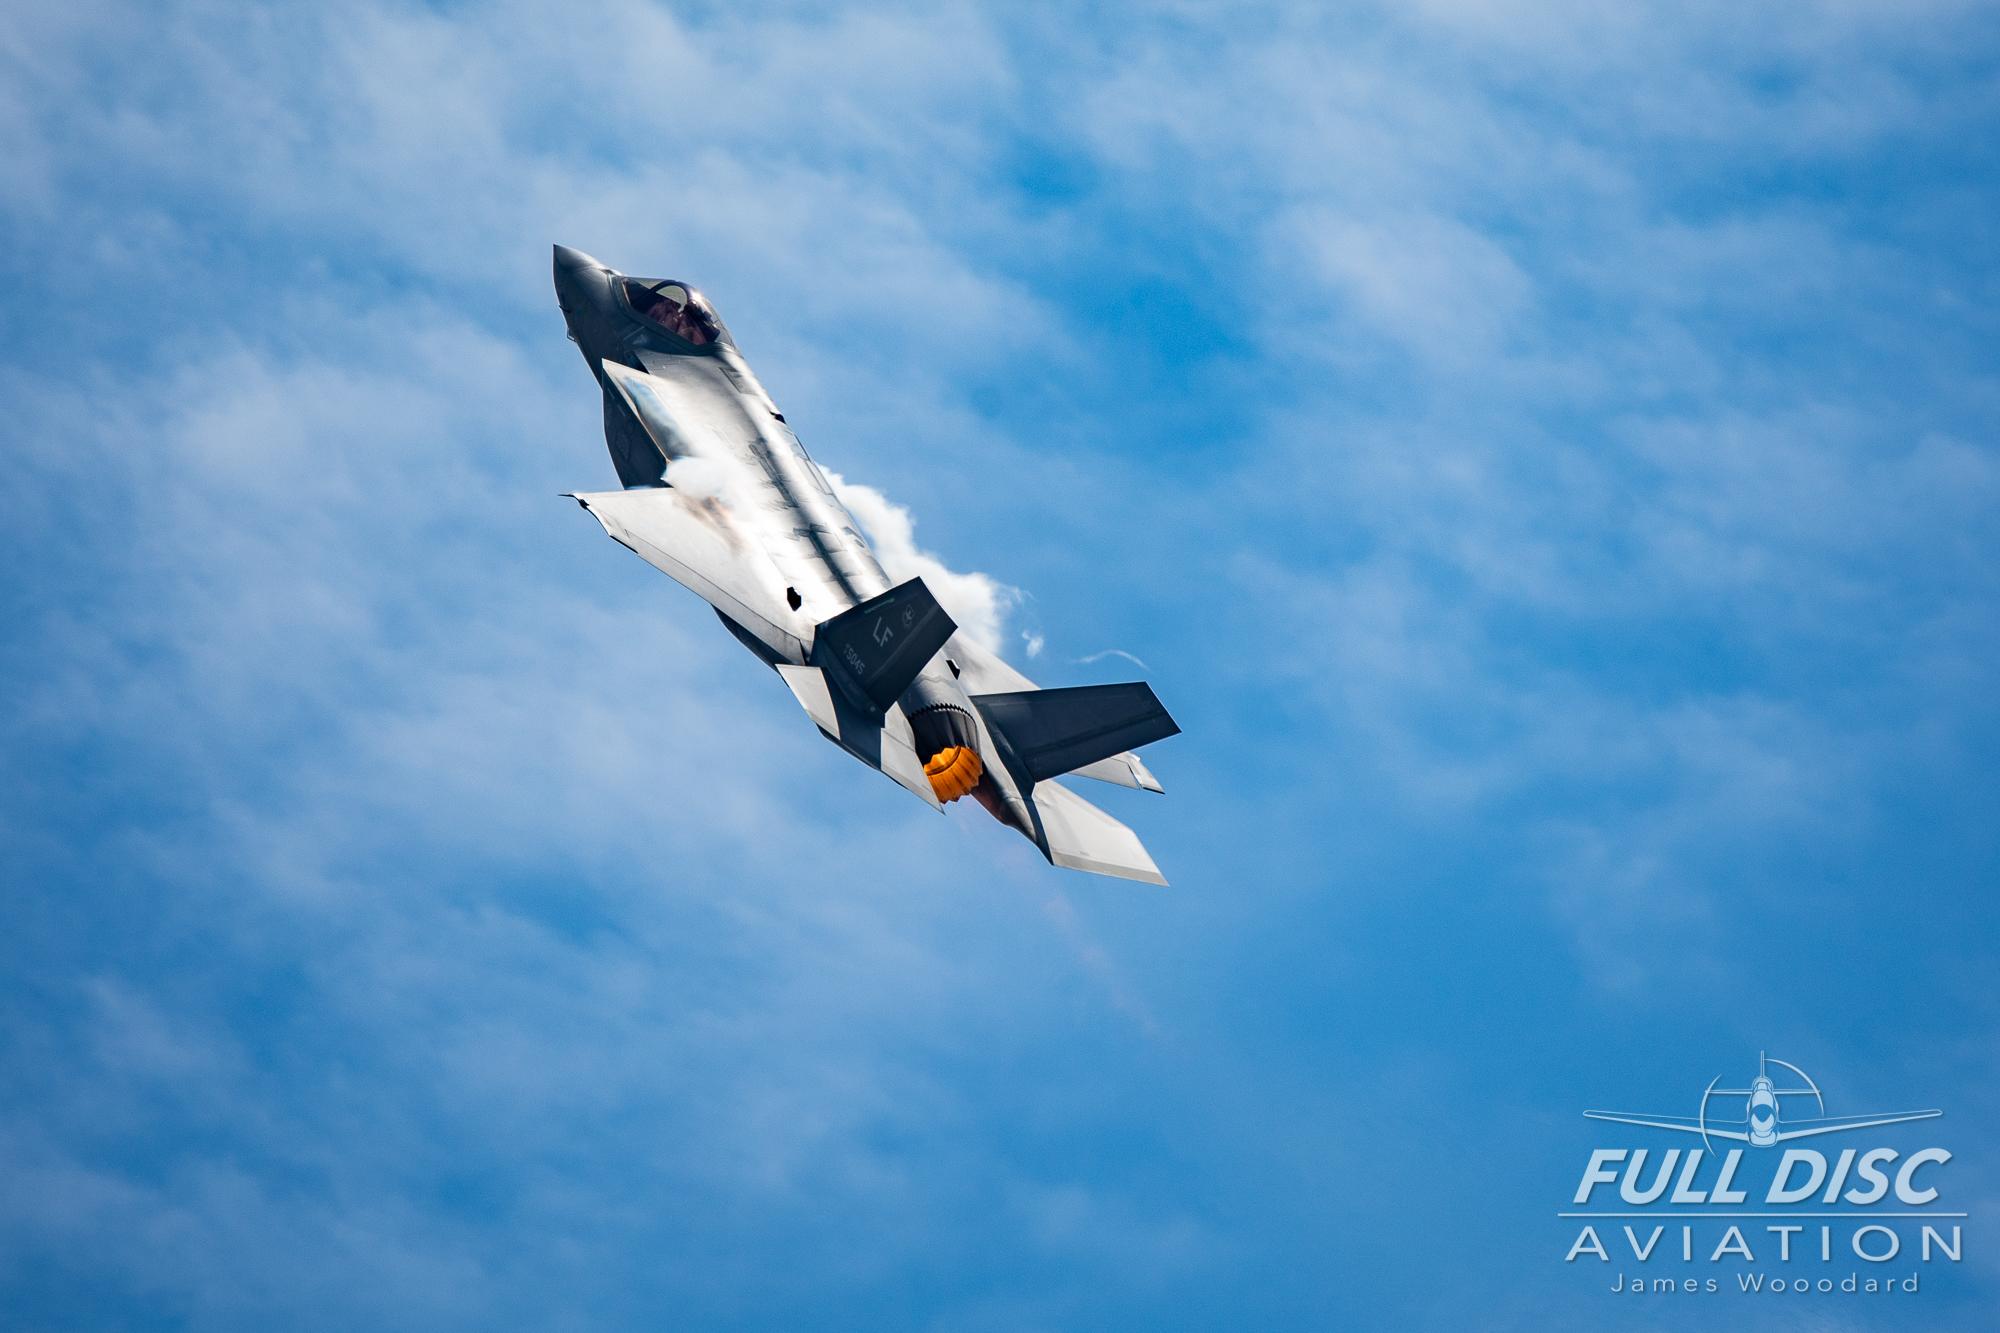 F35DemoTeam_FullDiscAviation_JamesWoodard-April 28, 2019-42.jpg